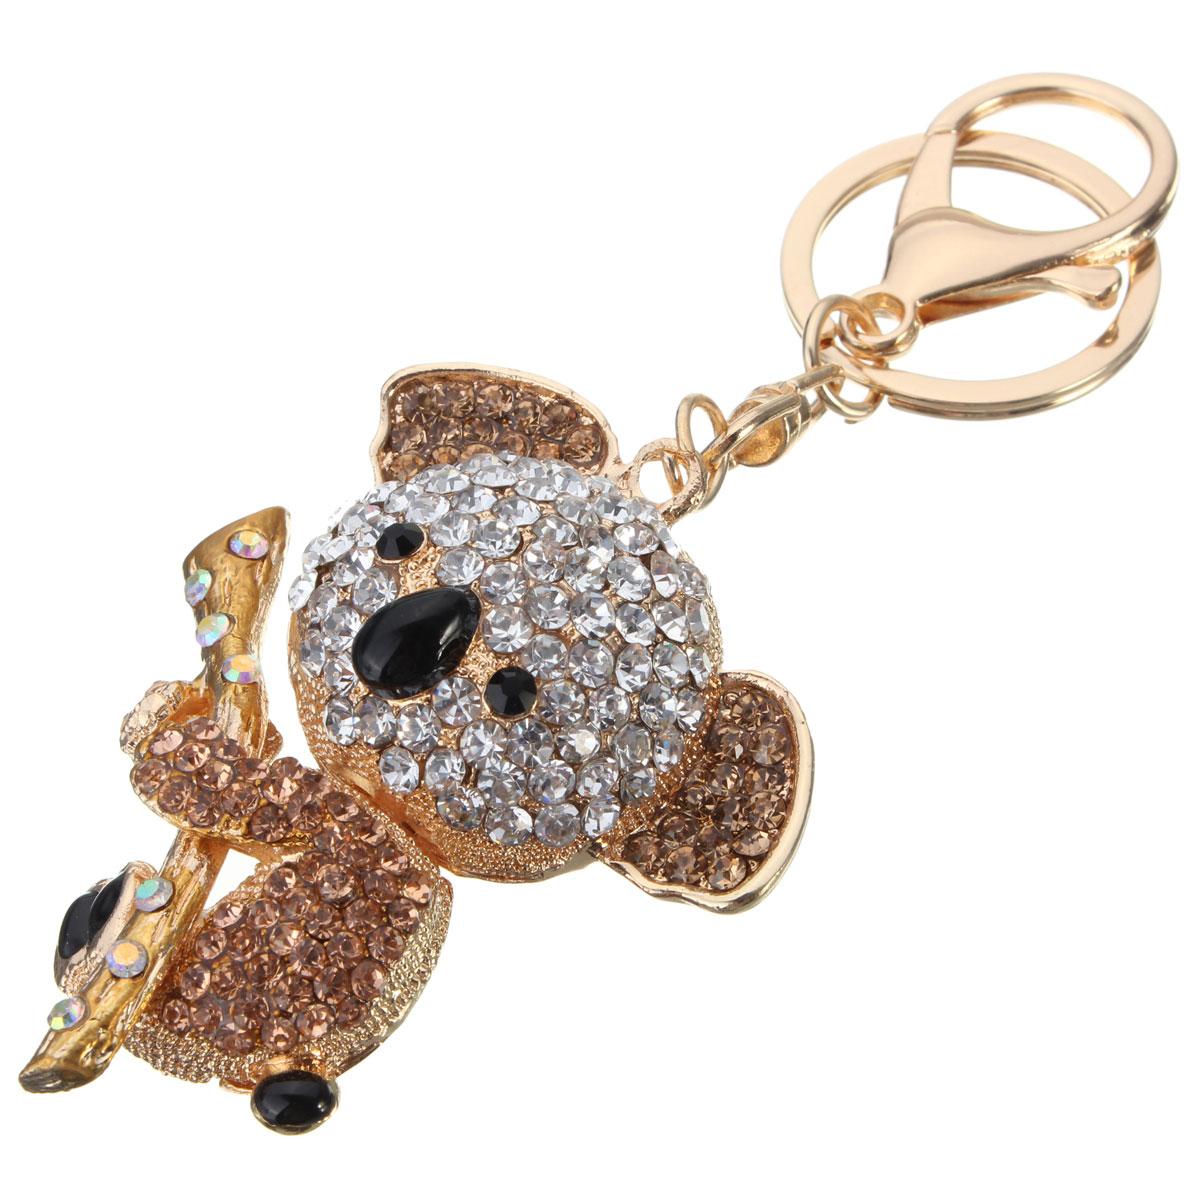 Purse Jewelry: Cute Koala Bear Rhinestone Crystal Pendant Purse Bag Charm